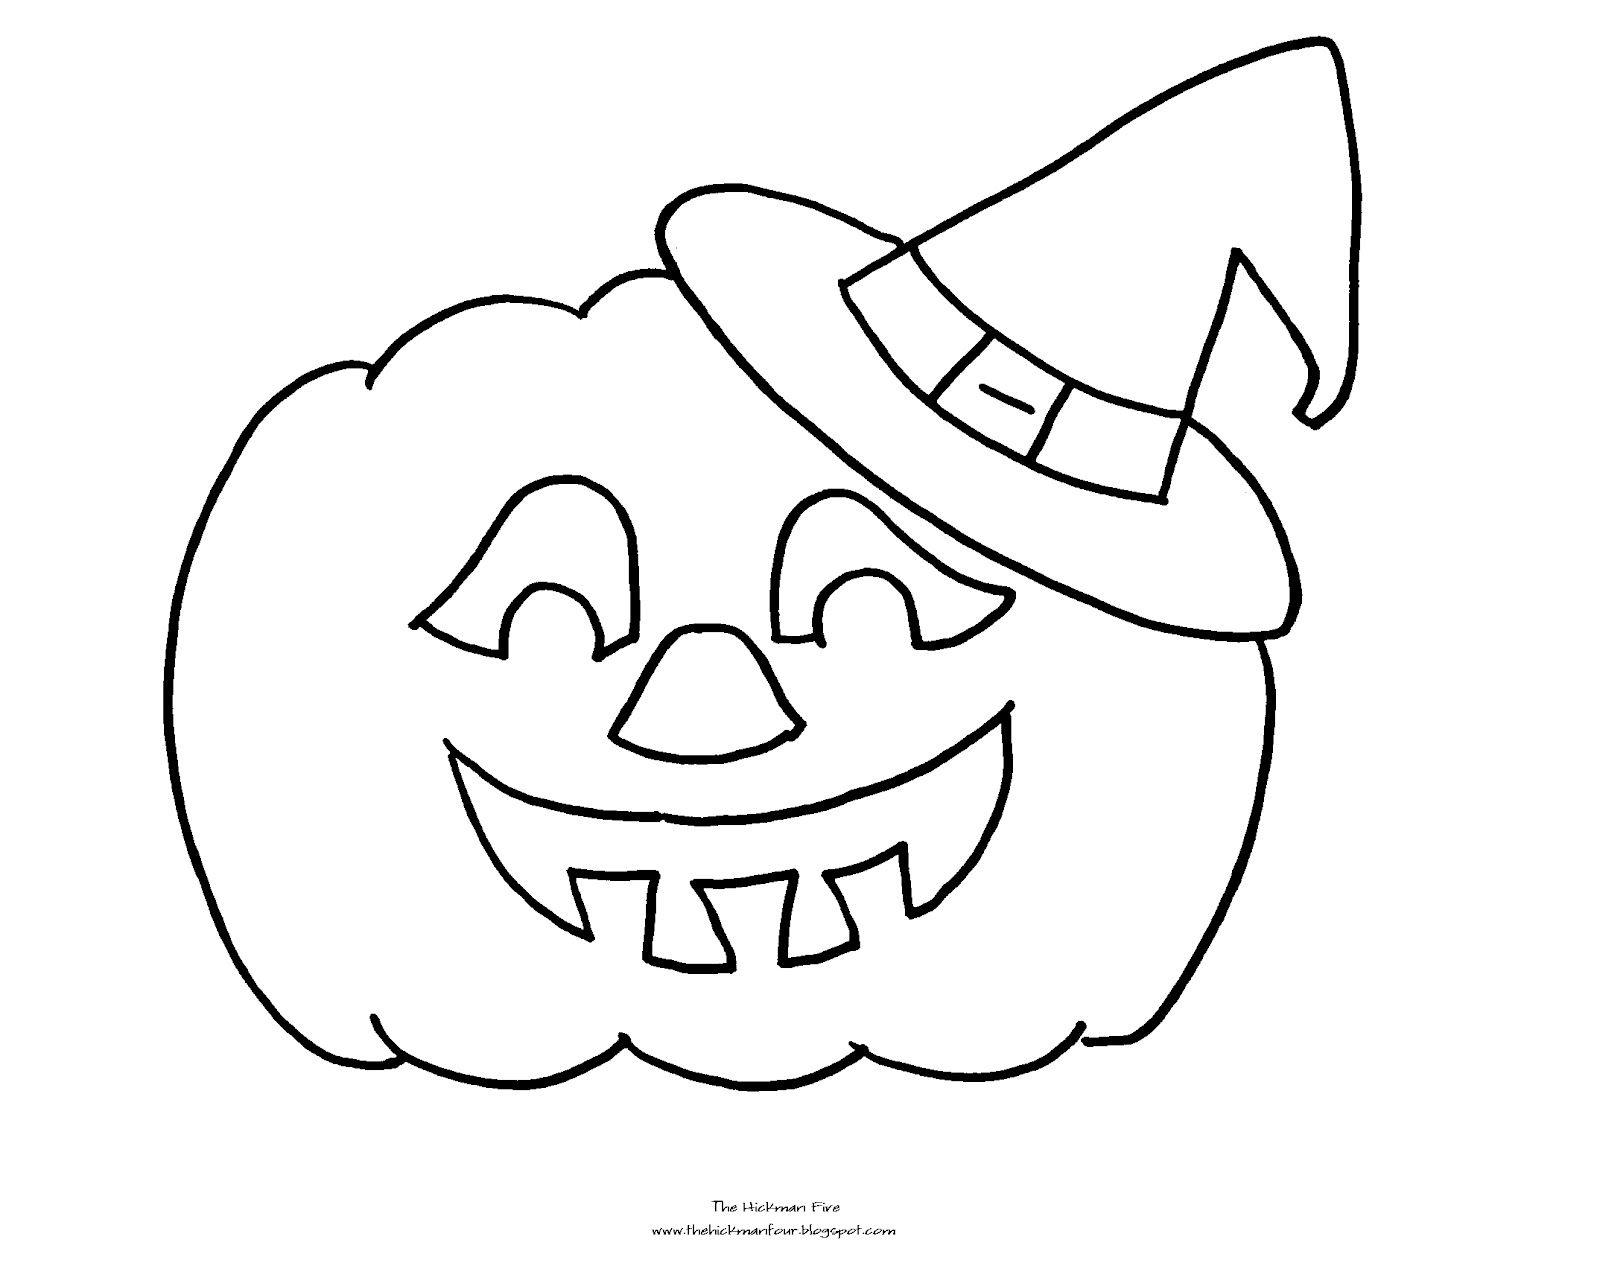 jack o lantern coloring page | kids | Pinterest | Kindergarten